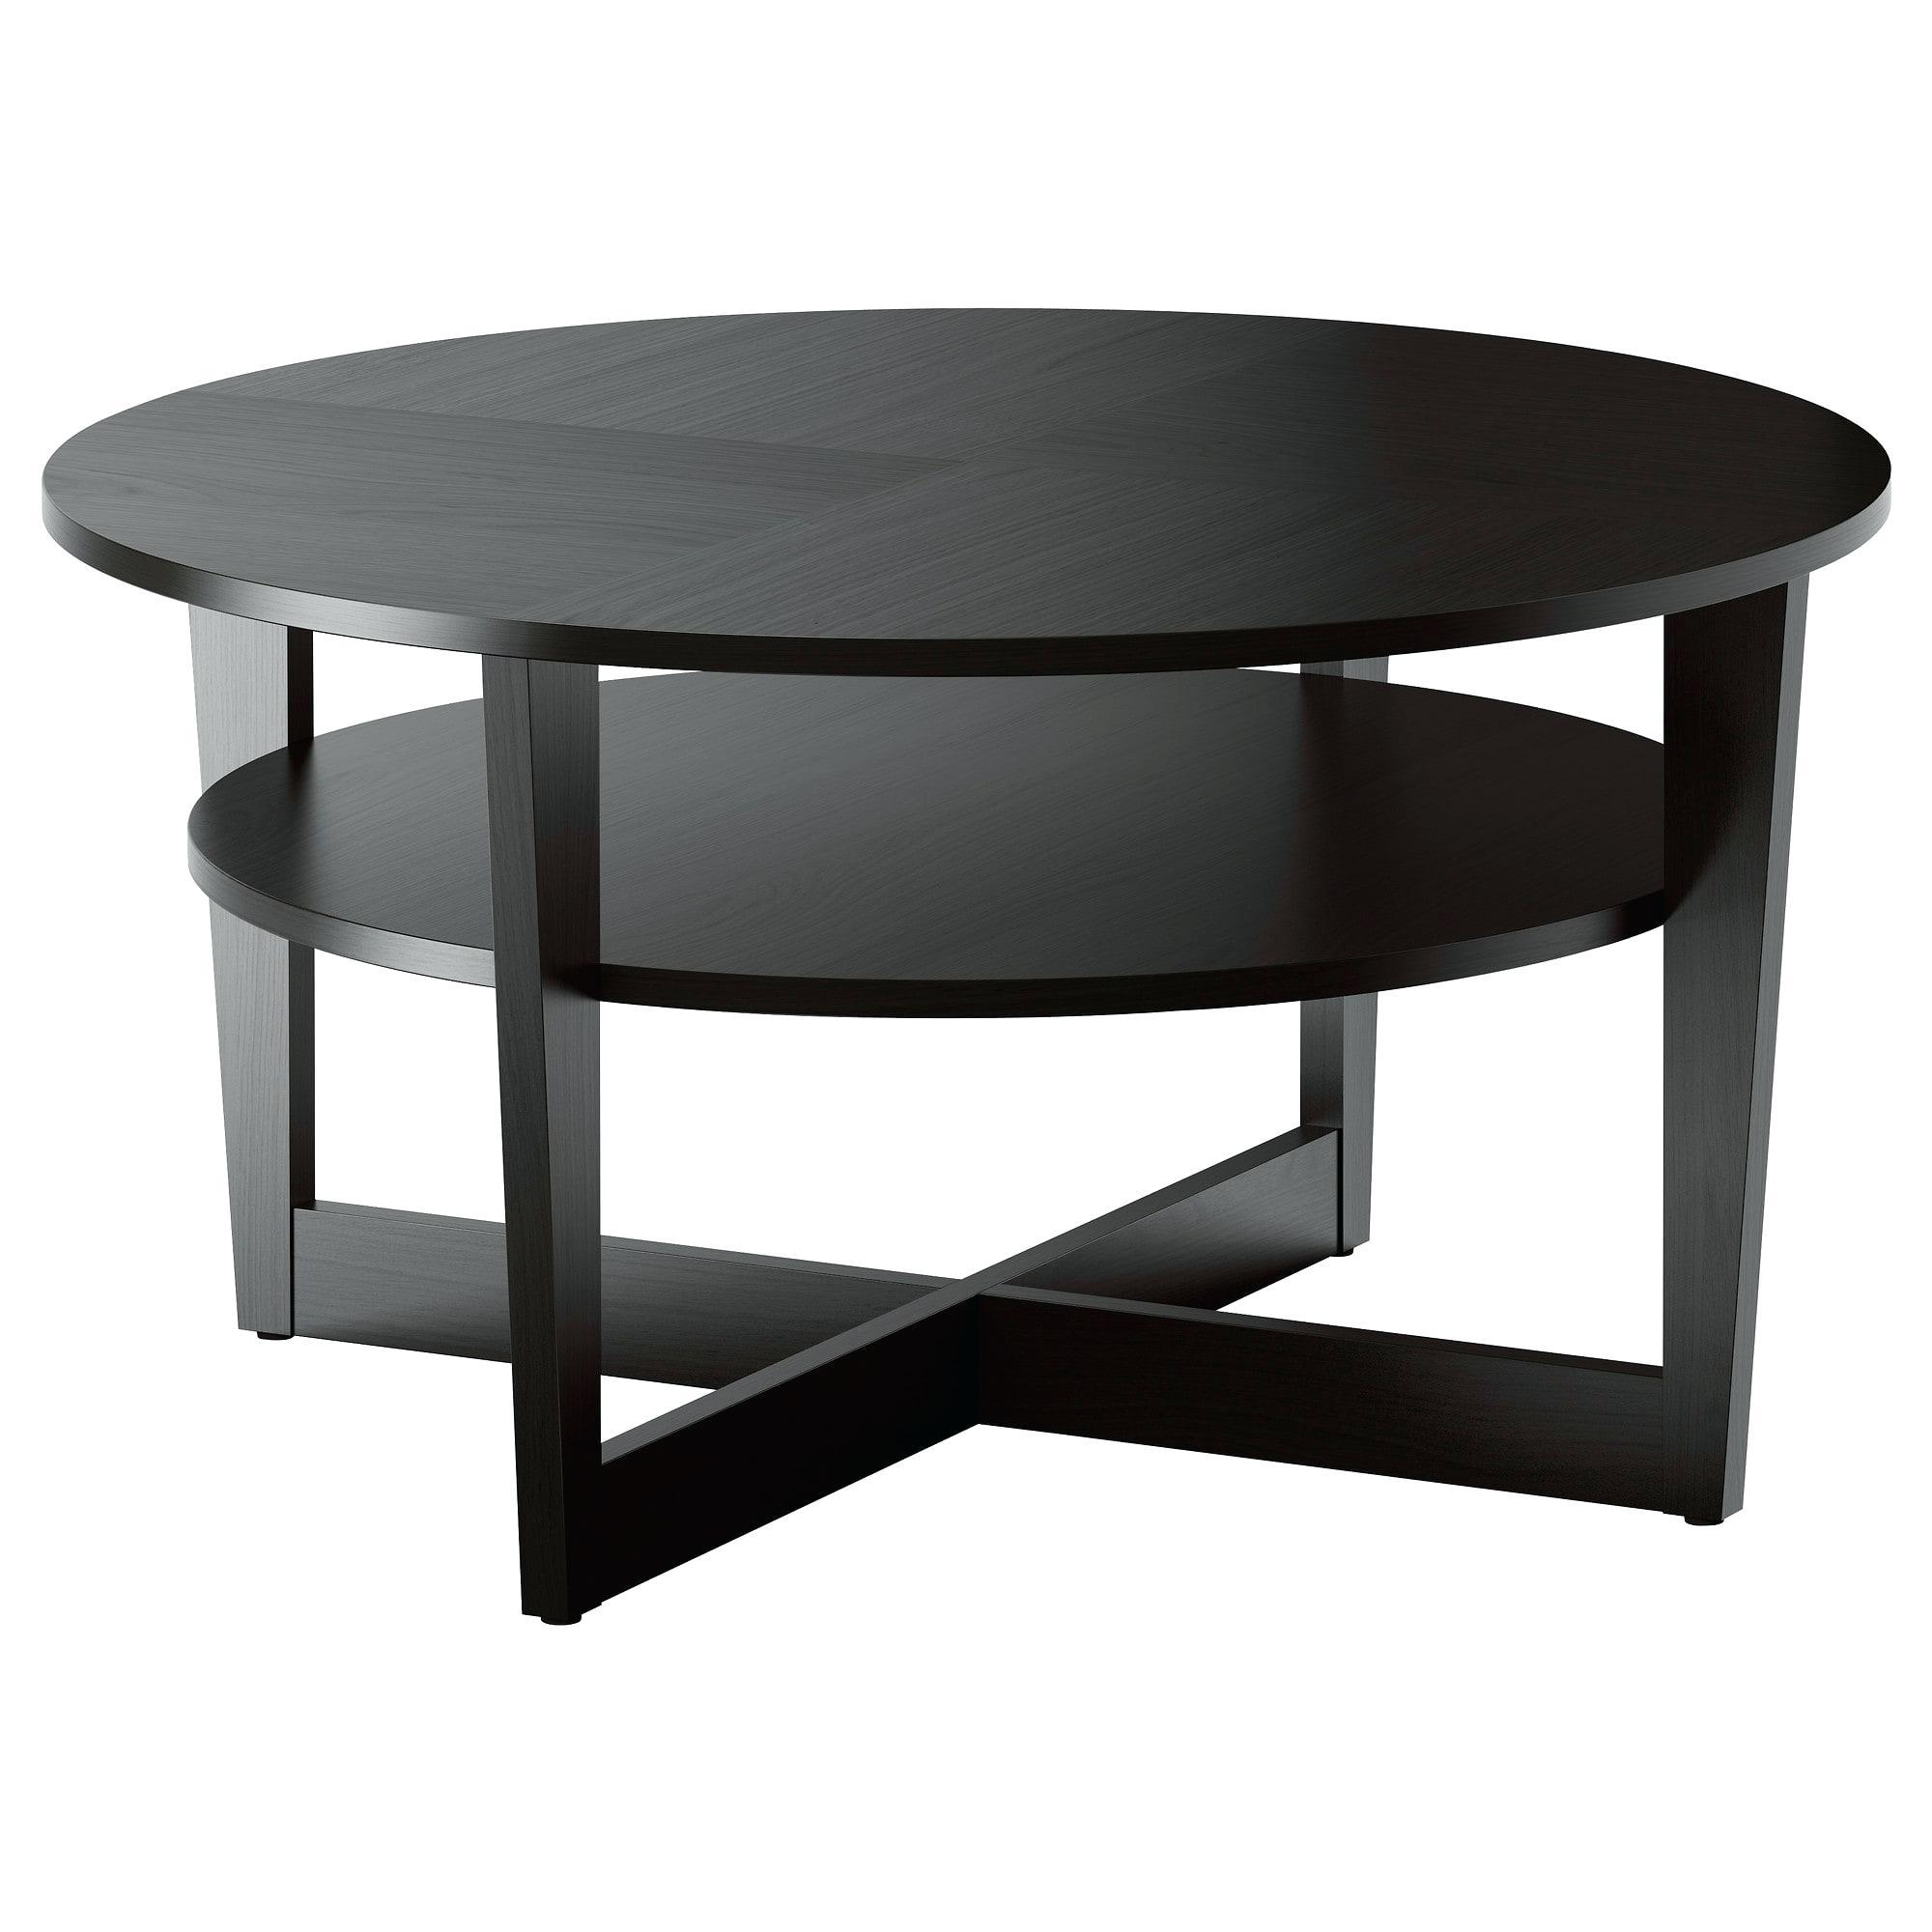 Table Basse Ikea Noir – Razvan.co pour Table Basse De Jardin Ikea